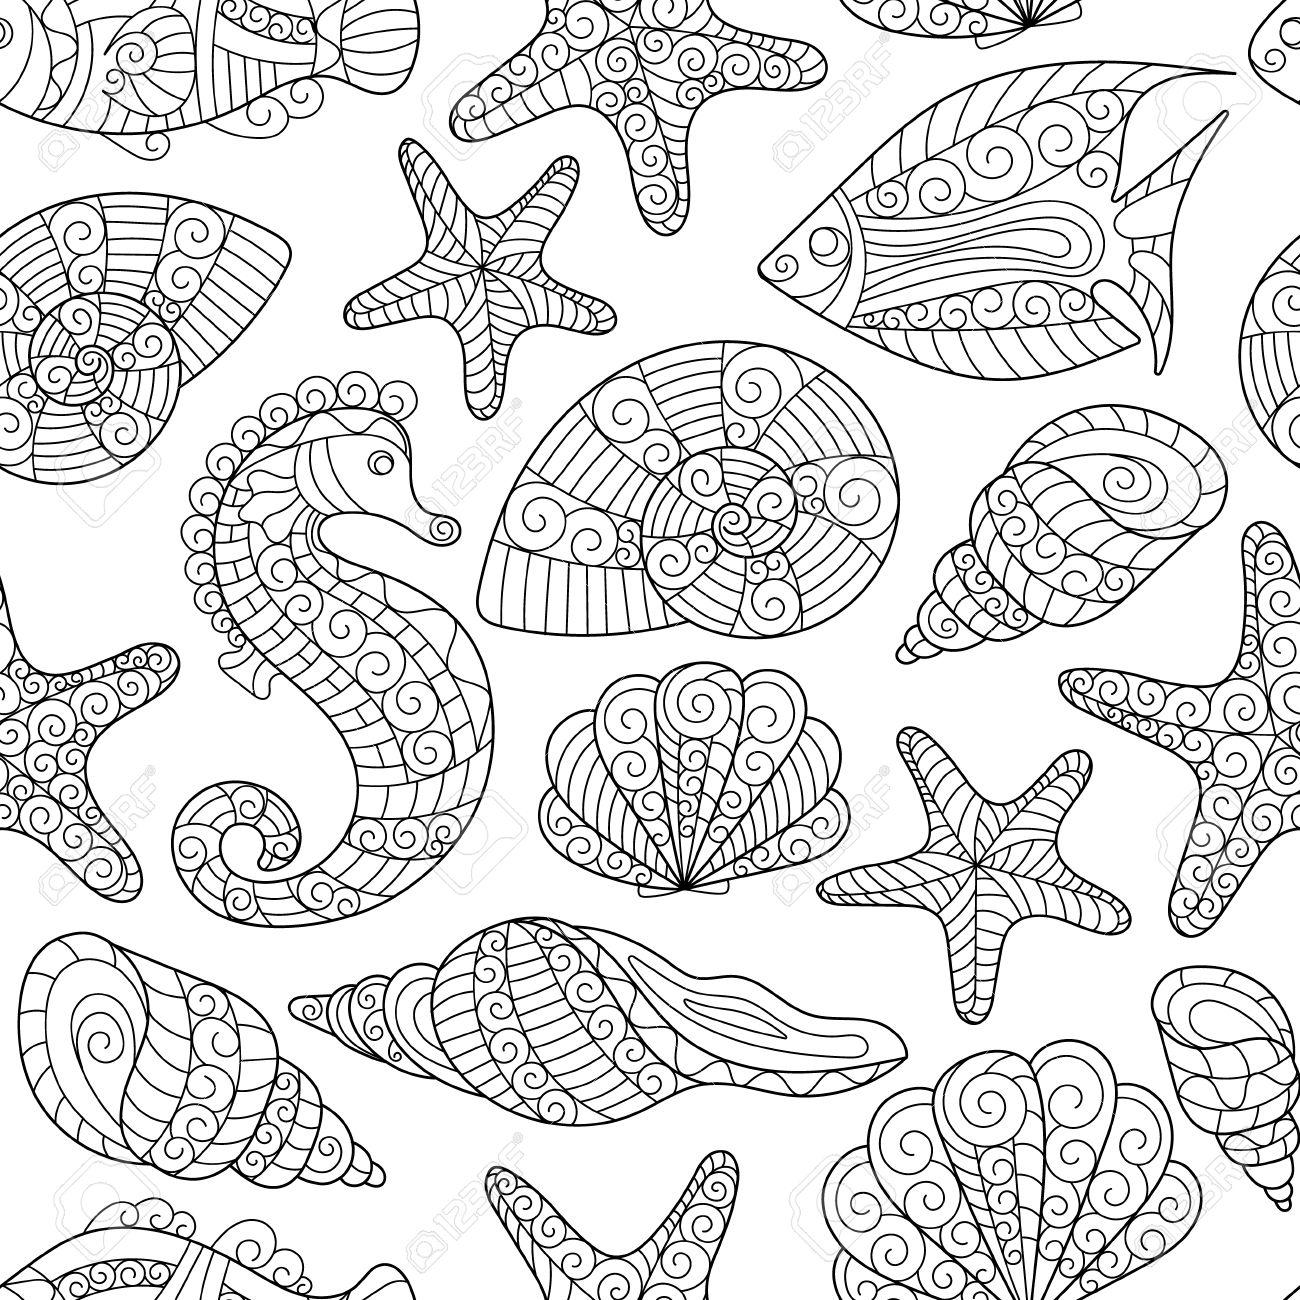 Modelo Inconsútil Blanco Y Negro Para Colorear Conchas De Mar Estrellas De Mar Caballitos De Mar Peces Doodle De Dibujo A Mano De Fondo